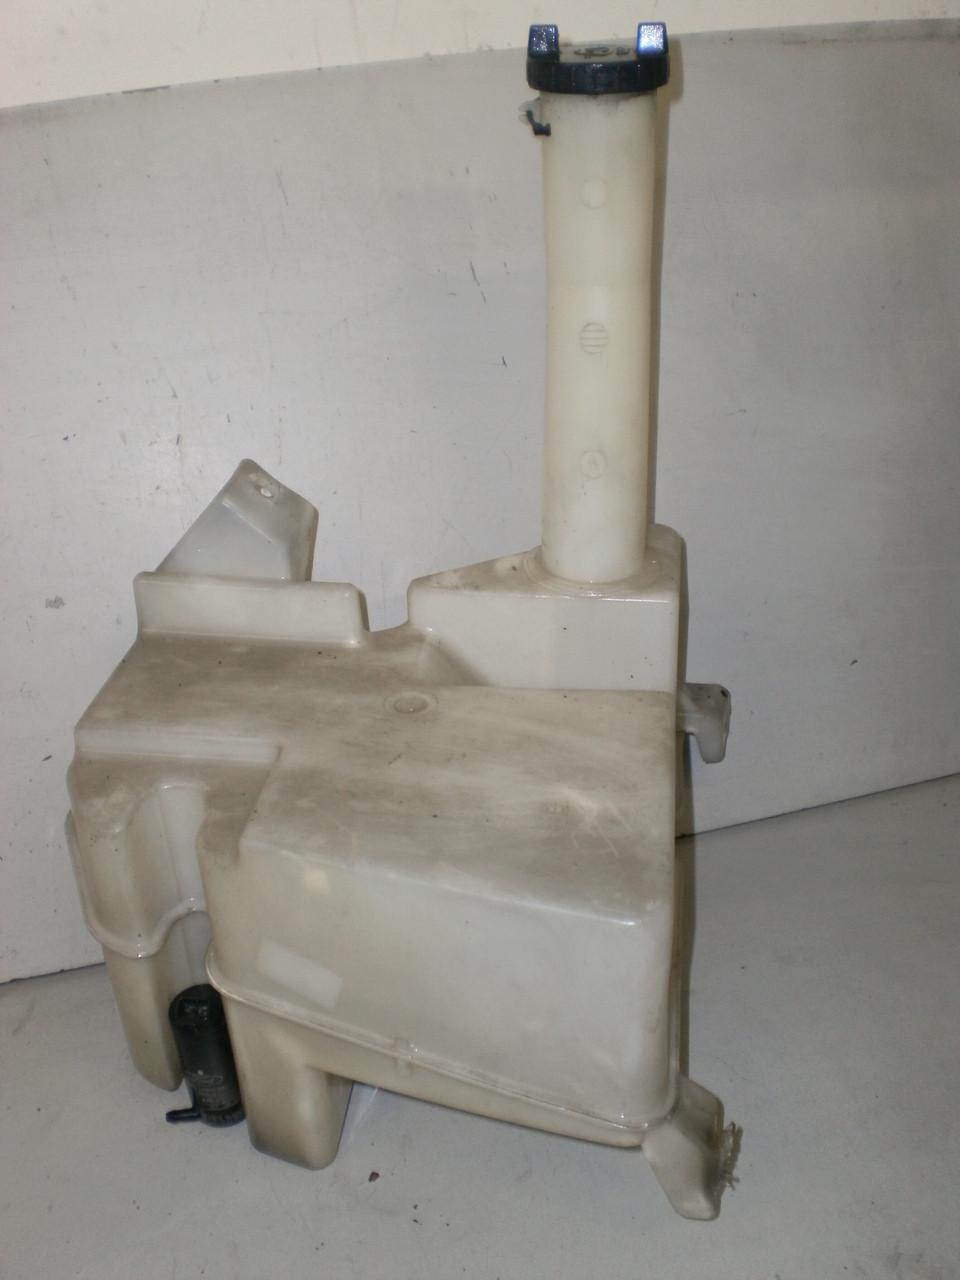 JAGUAR S-TYPE FUEL TANK SENDING UNIT V8 1999 2000 2001 2002